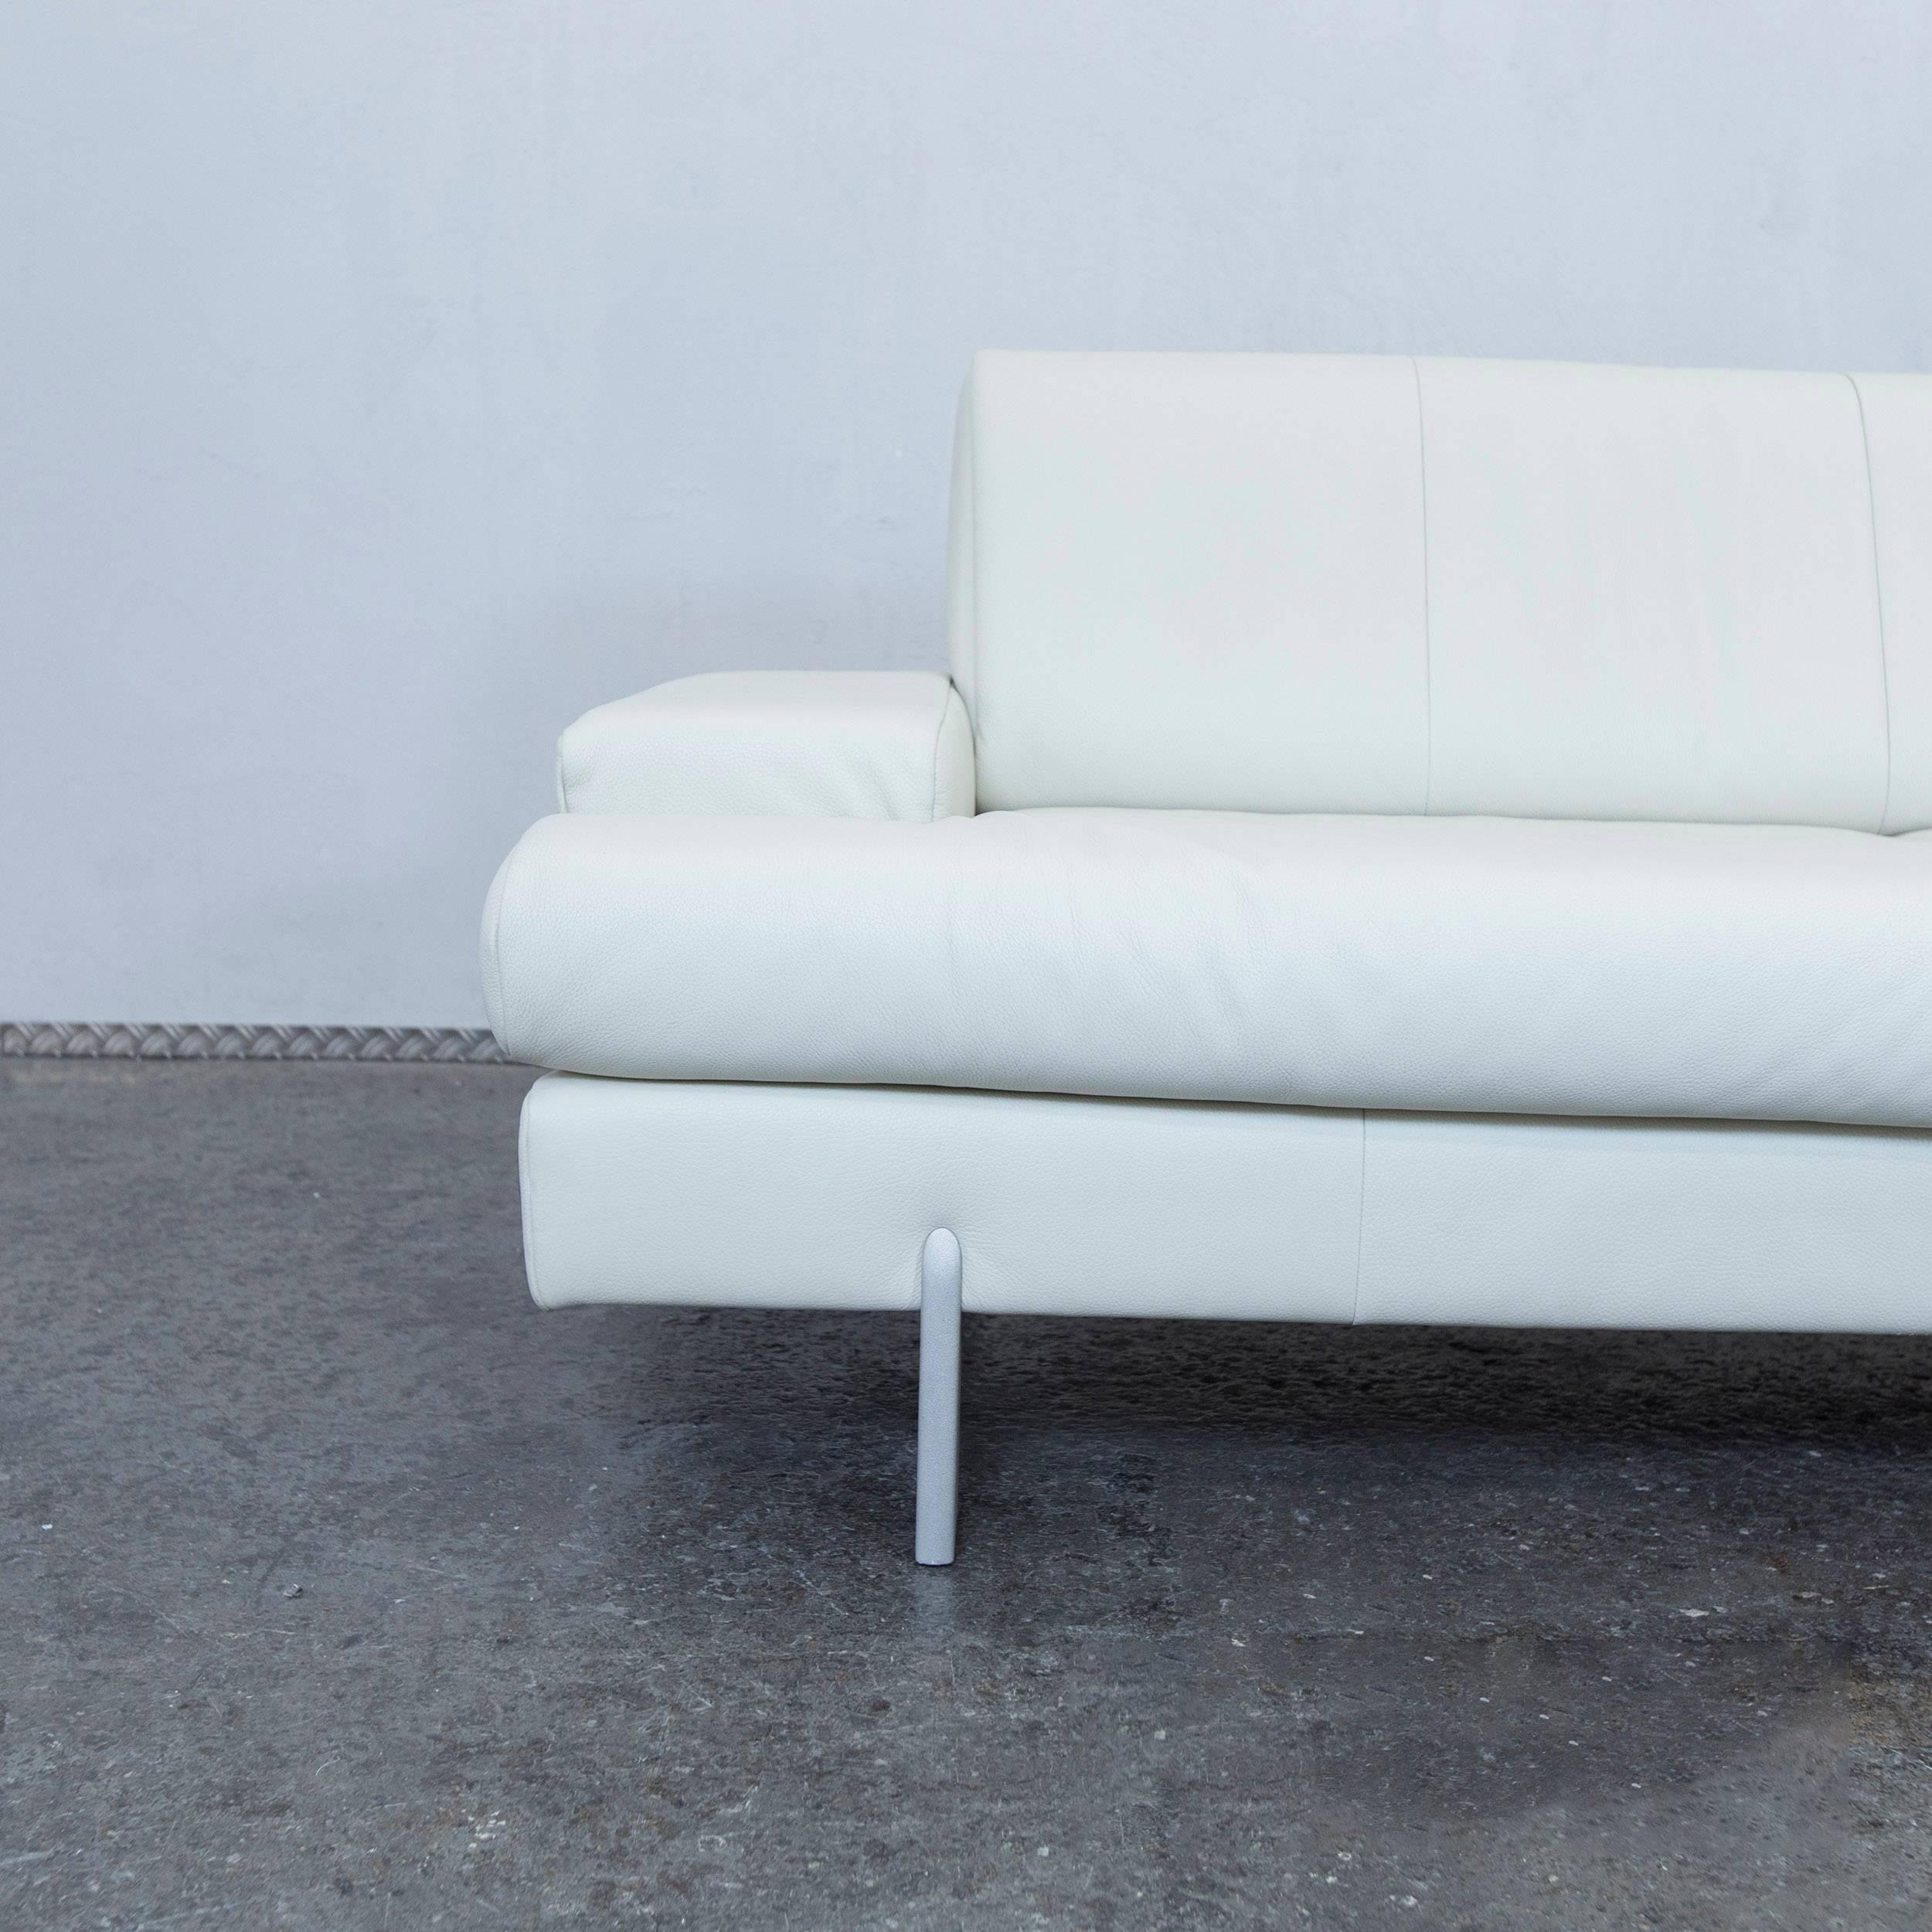 zweisitzer sofa wei great er sofa neu sofa wei f r. Black Bedroom Furniture Sets. Home Design Ideas